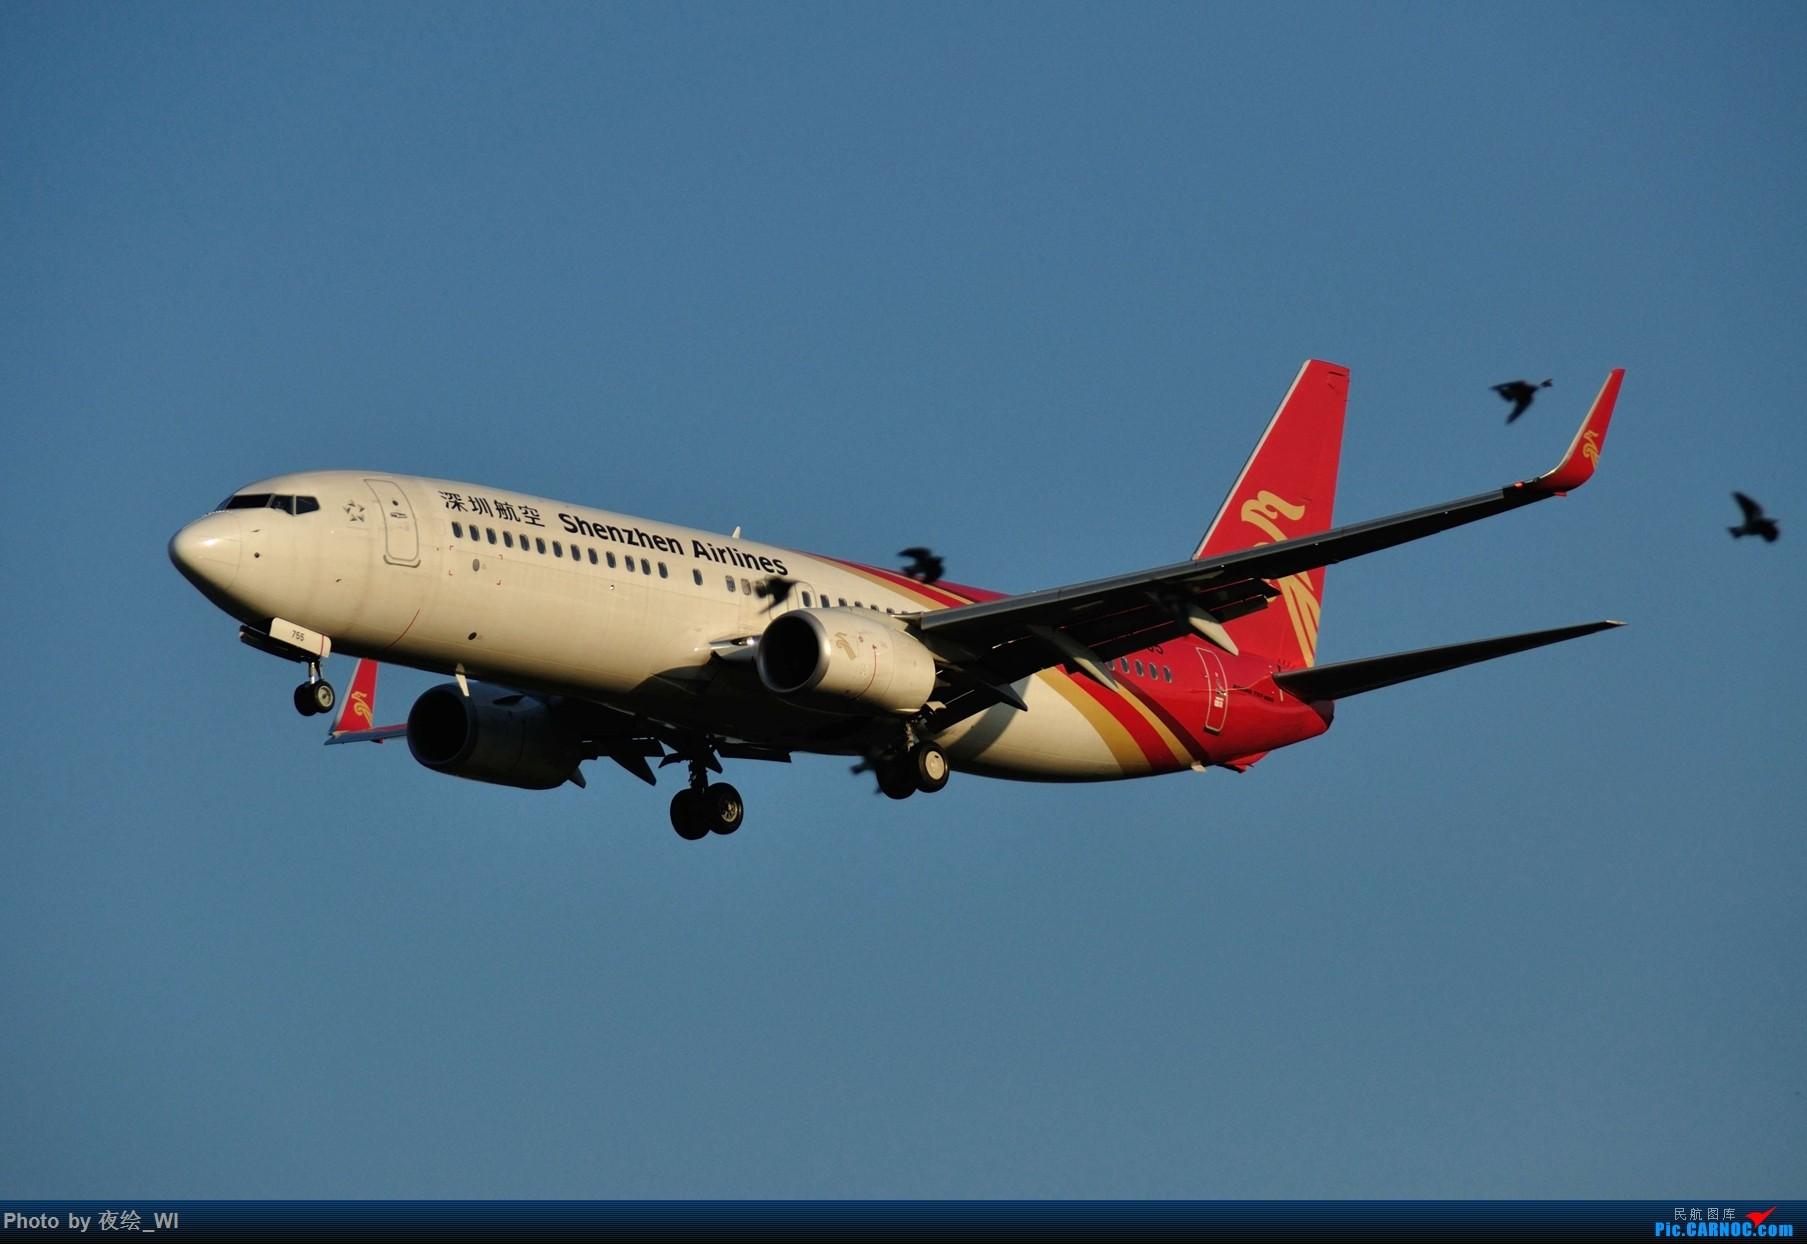 Re:[原创]【PEK】初刷八卦台,拍得飞起! BOEING 737-800 B-1755 中国北京首都国际机场